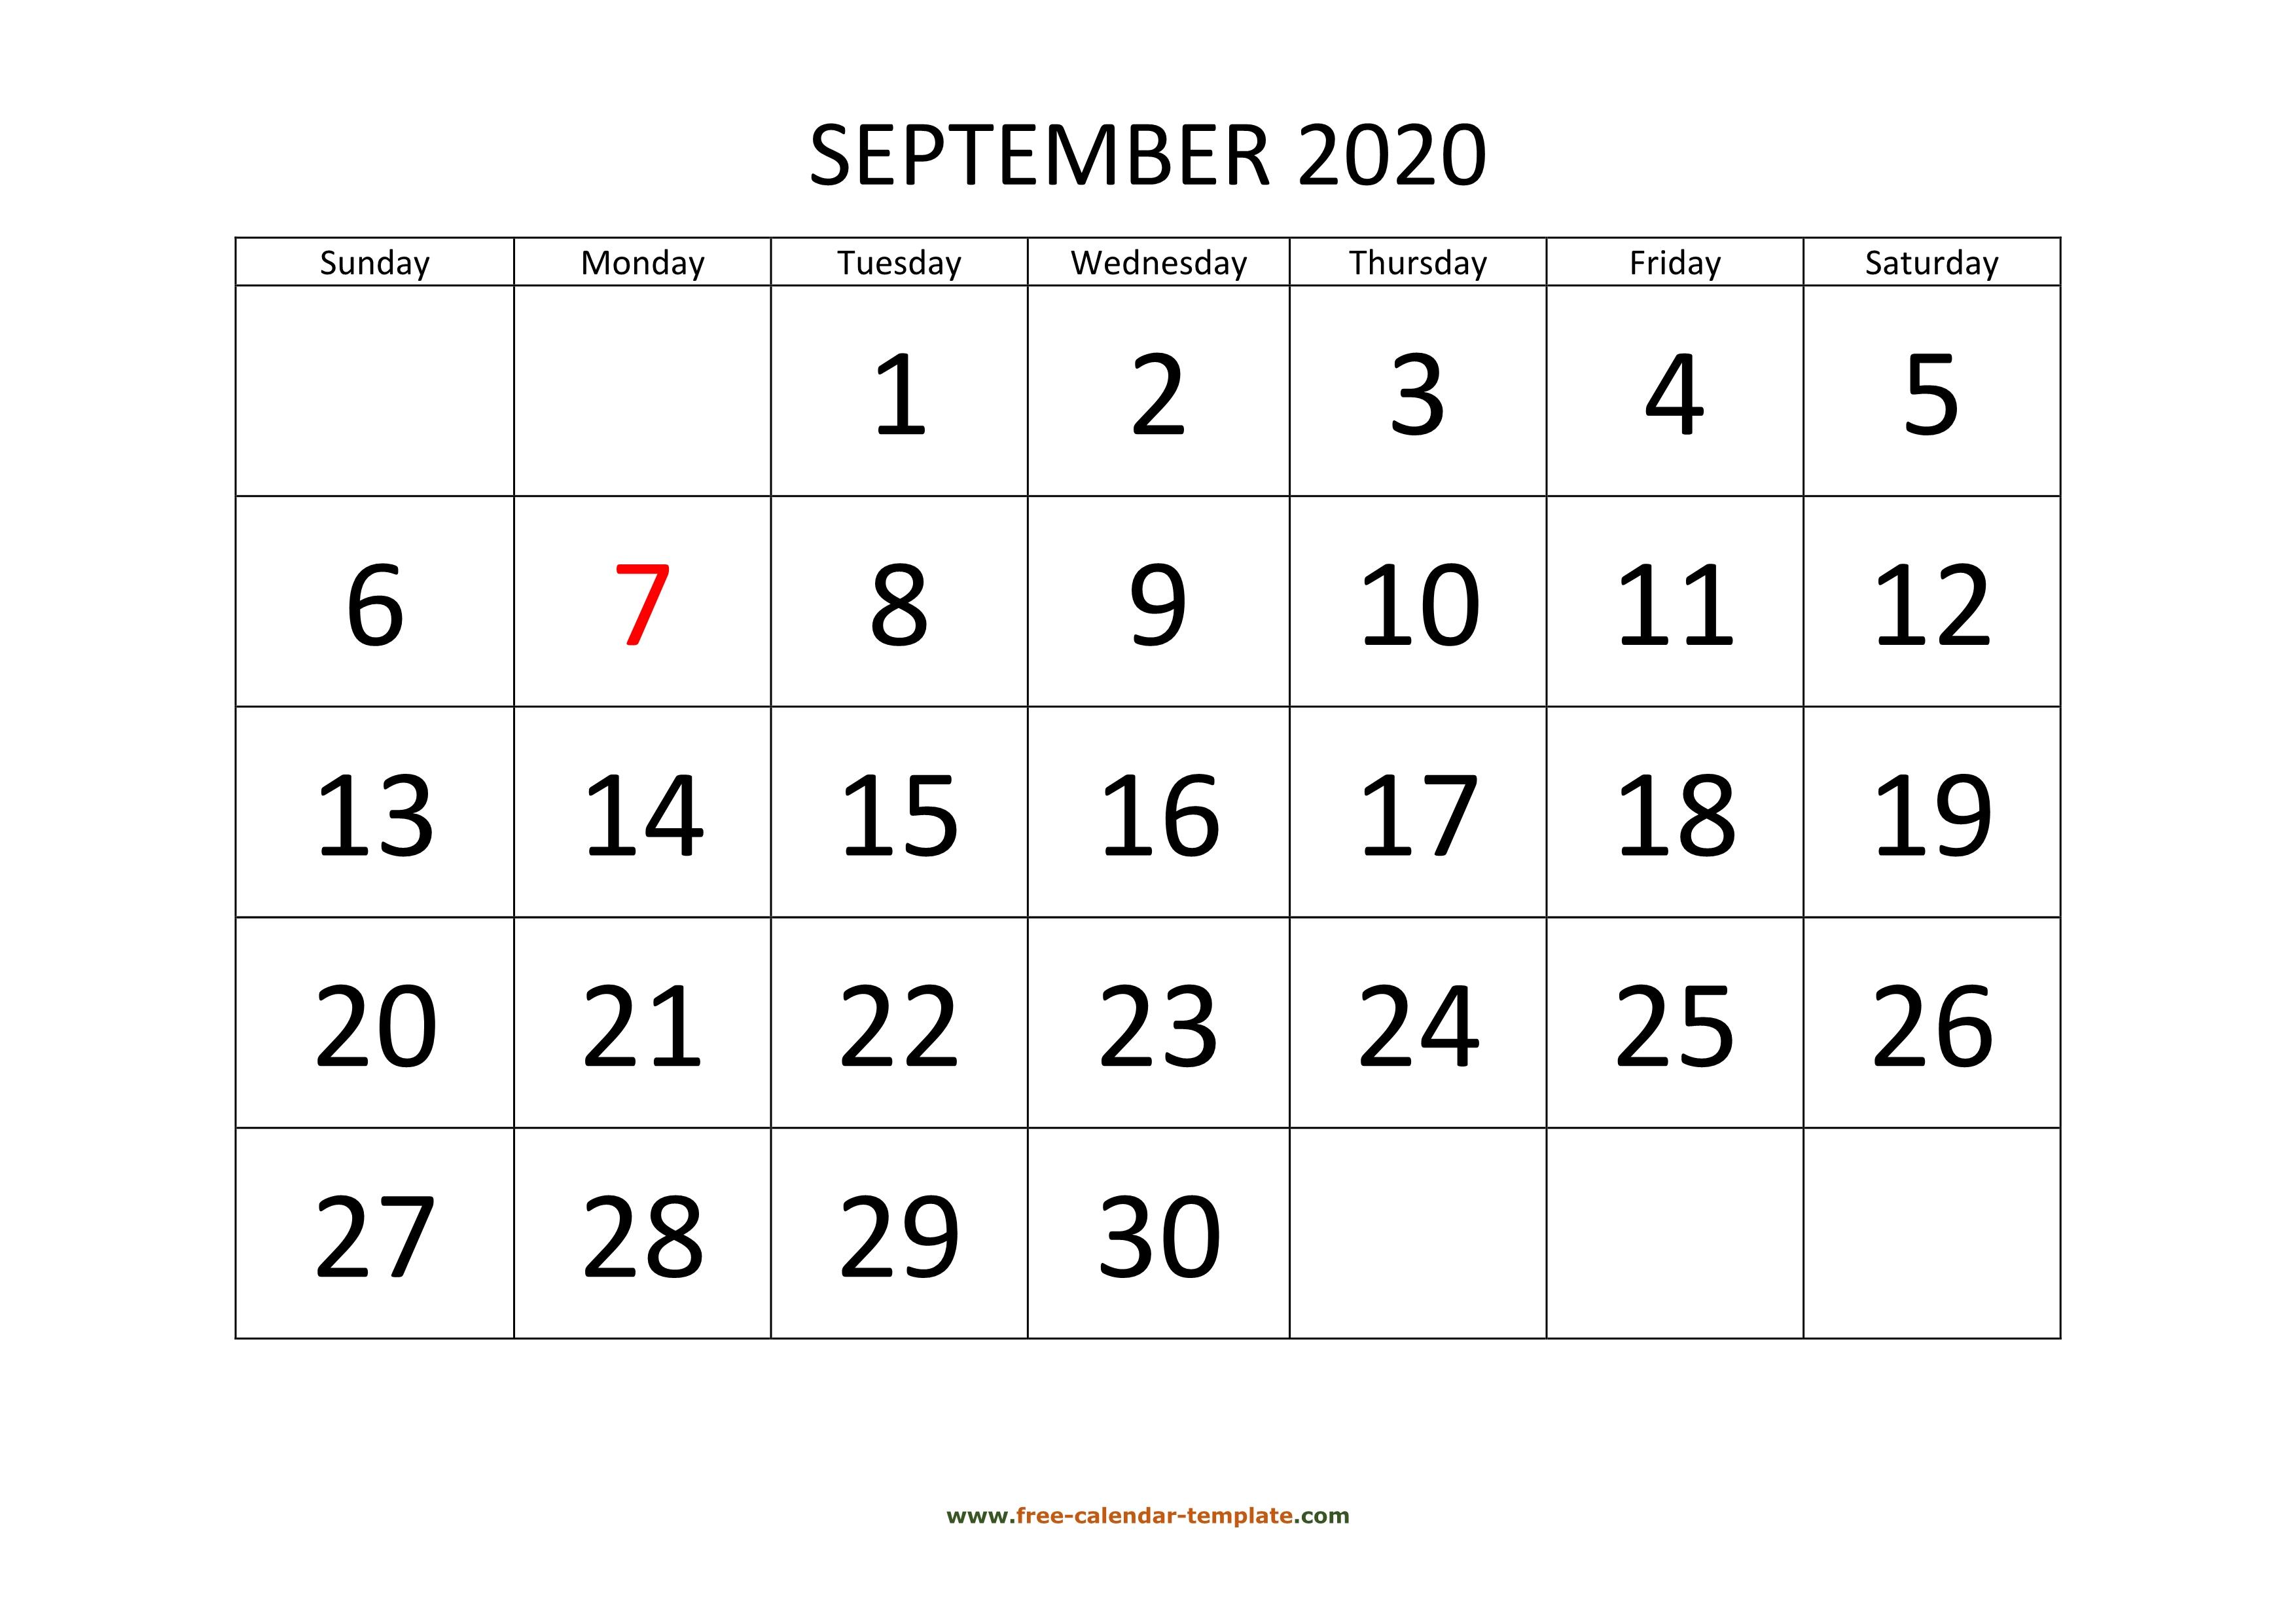 September 2020 Calendar Designed With Large Font (Horizontal inside 2020 Monday Through Sunday Calendar Template